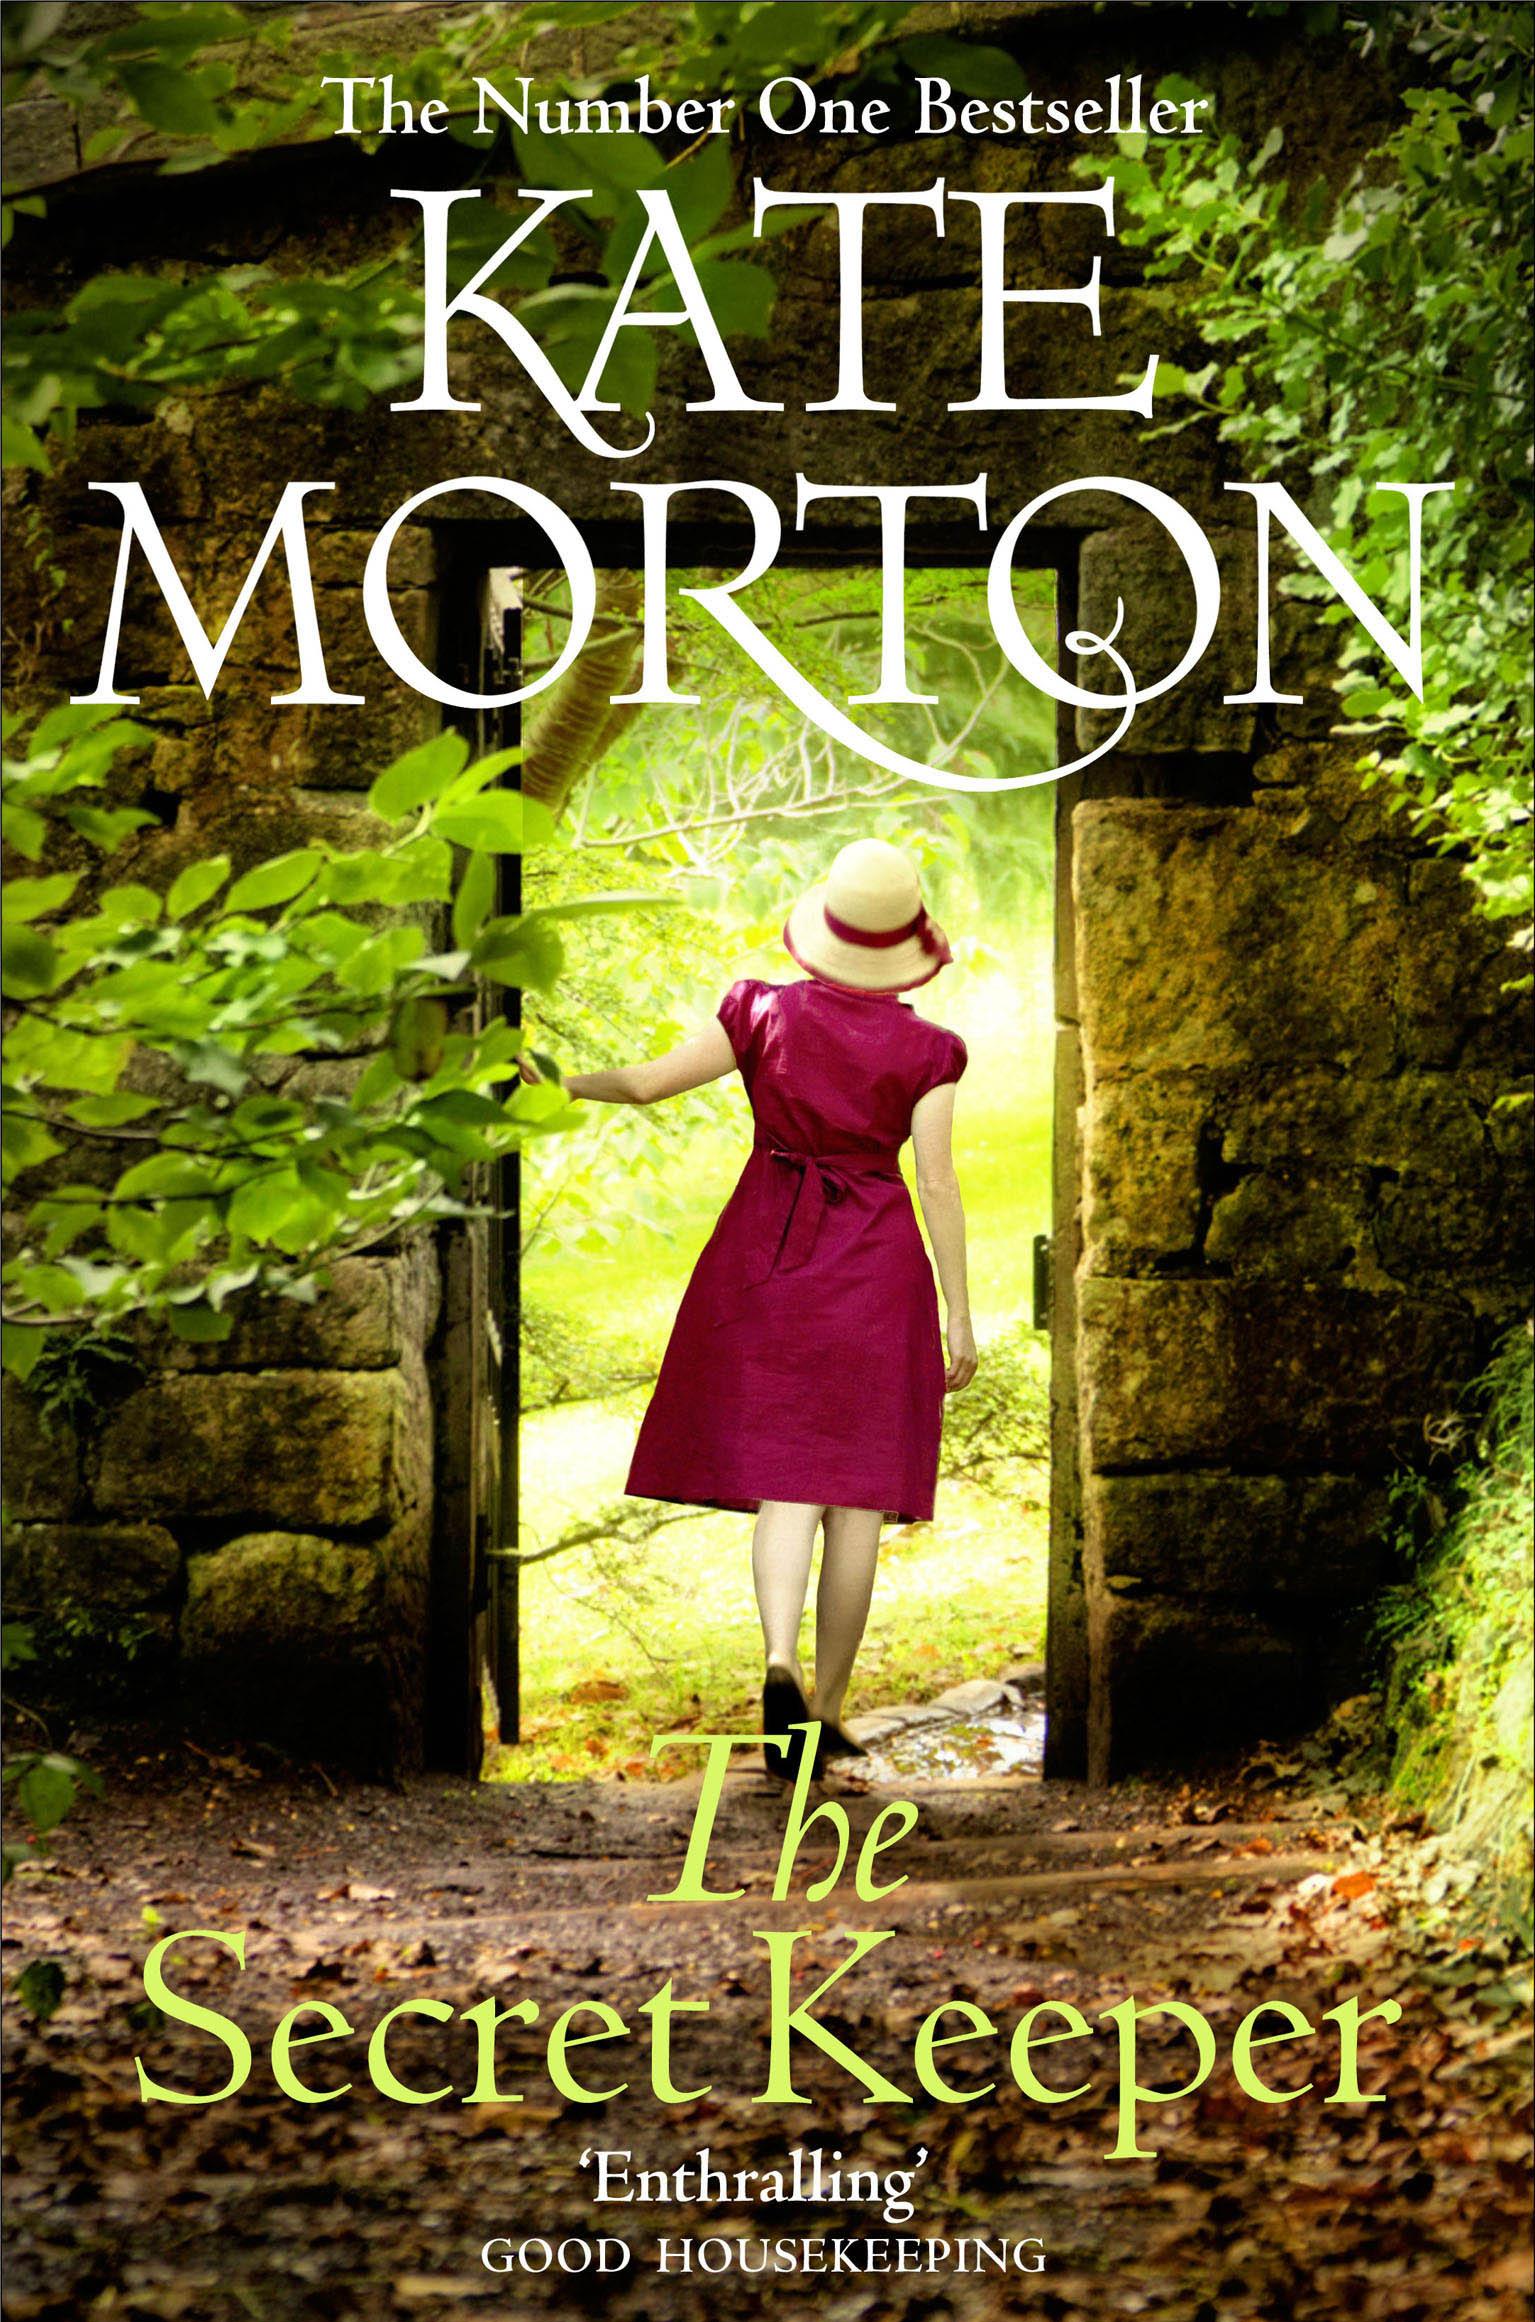 Watch The Secret Keeper, Kate Morton video